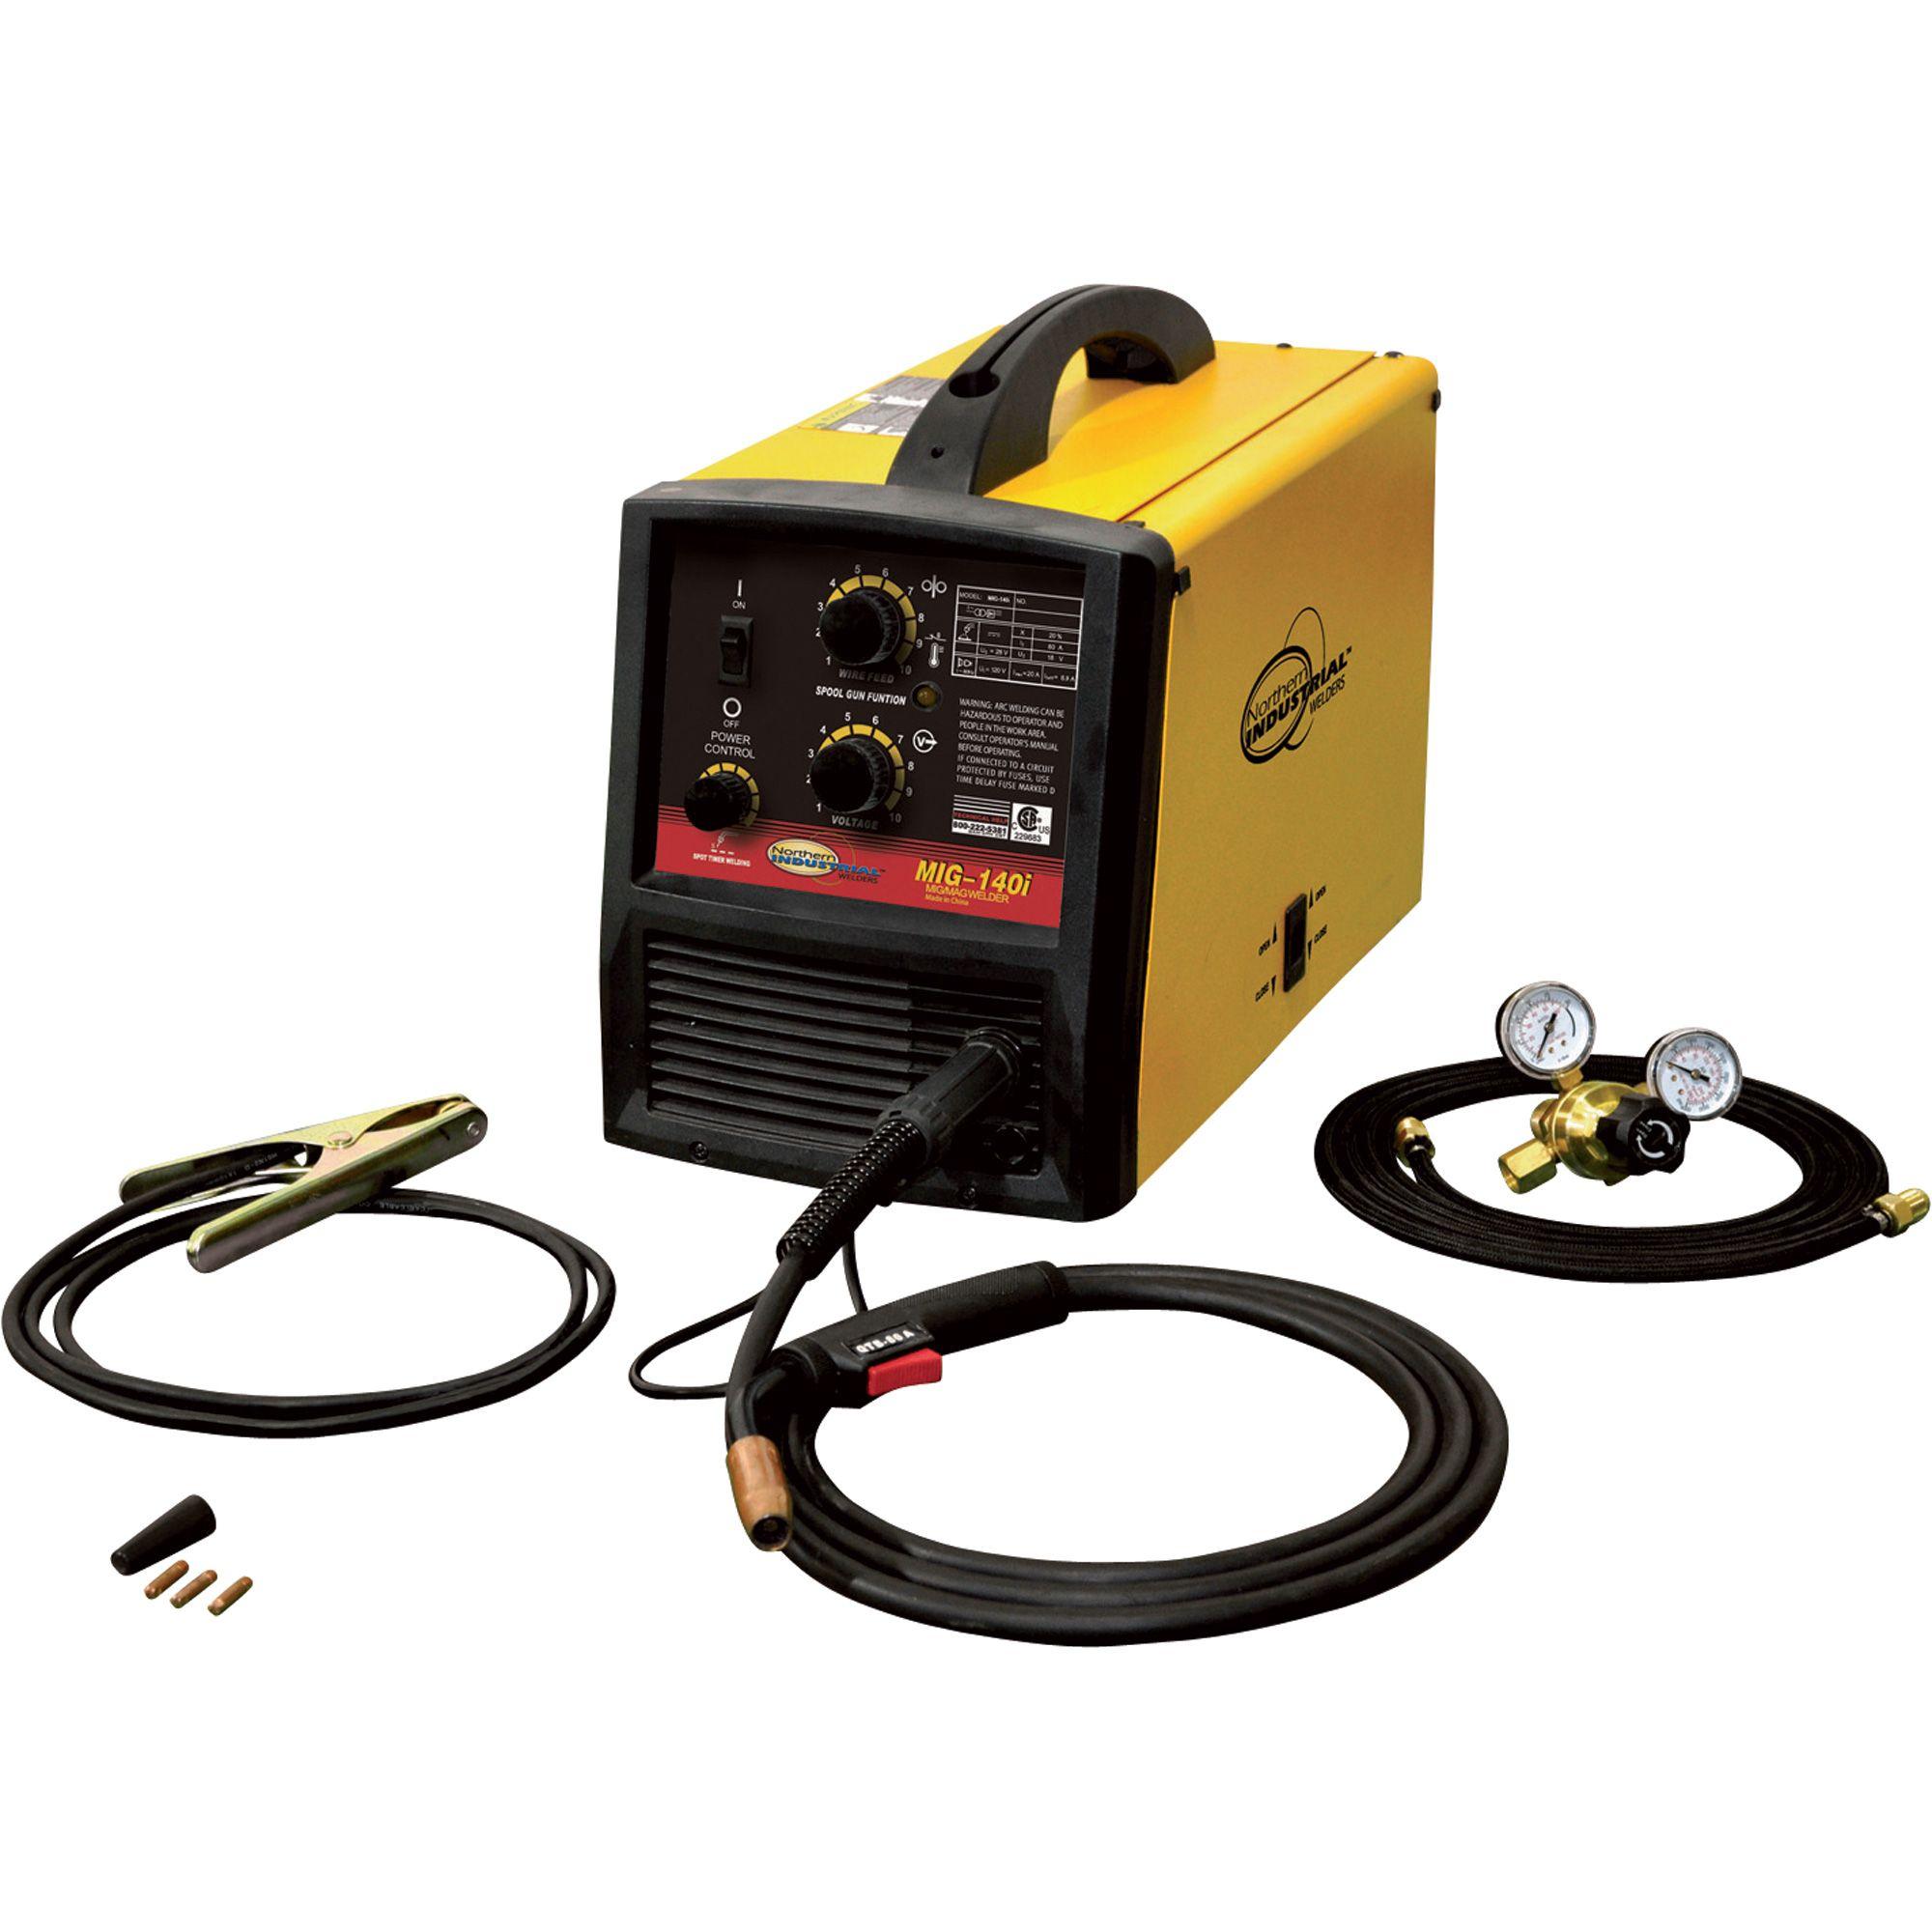 hobart 175 handler welder wiring diagram hobart arc welder